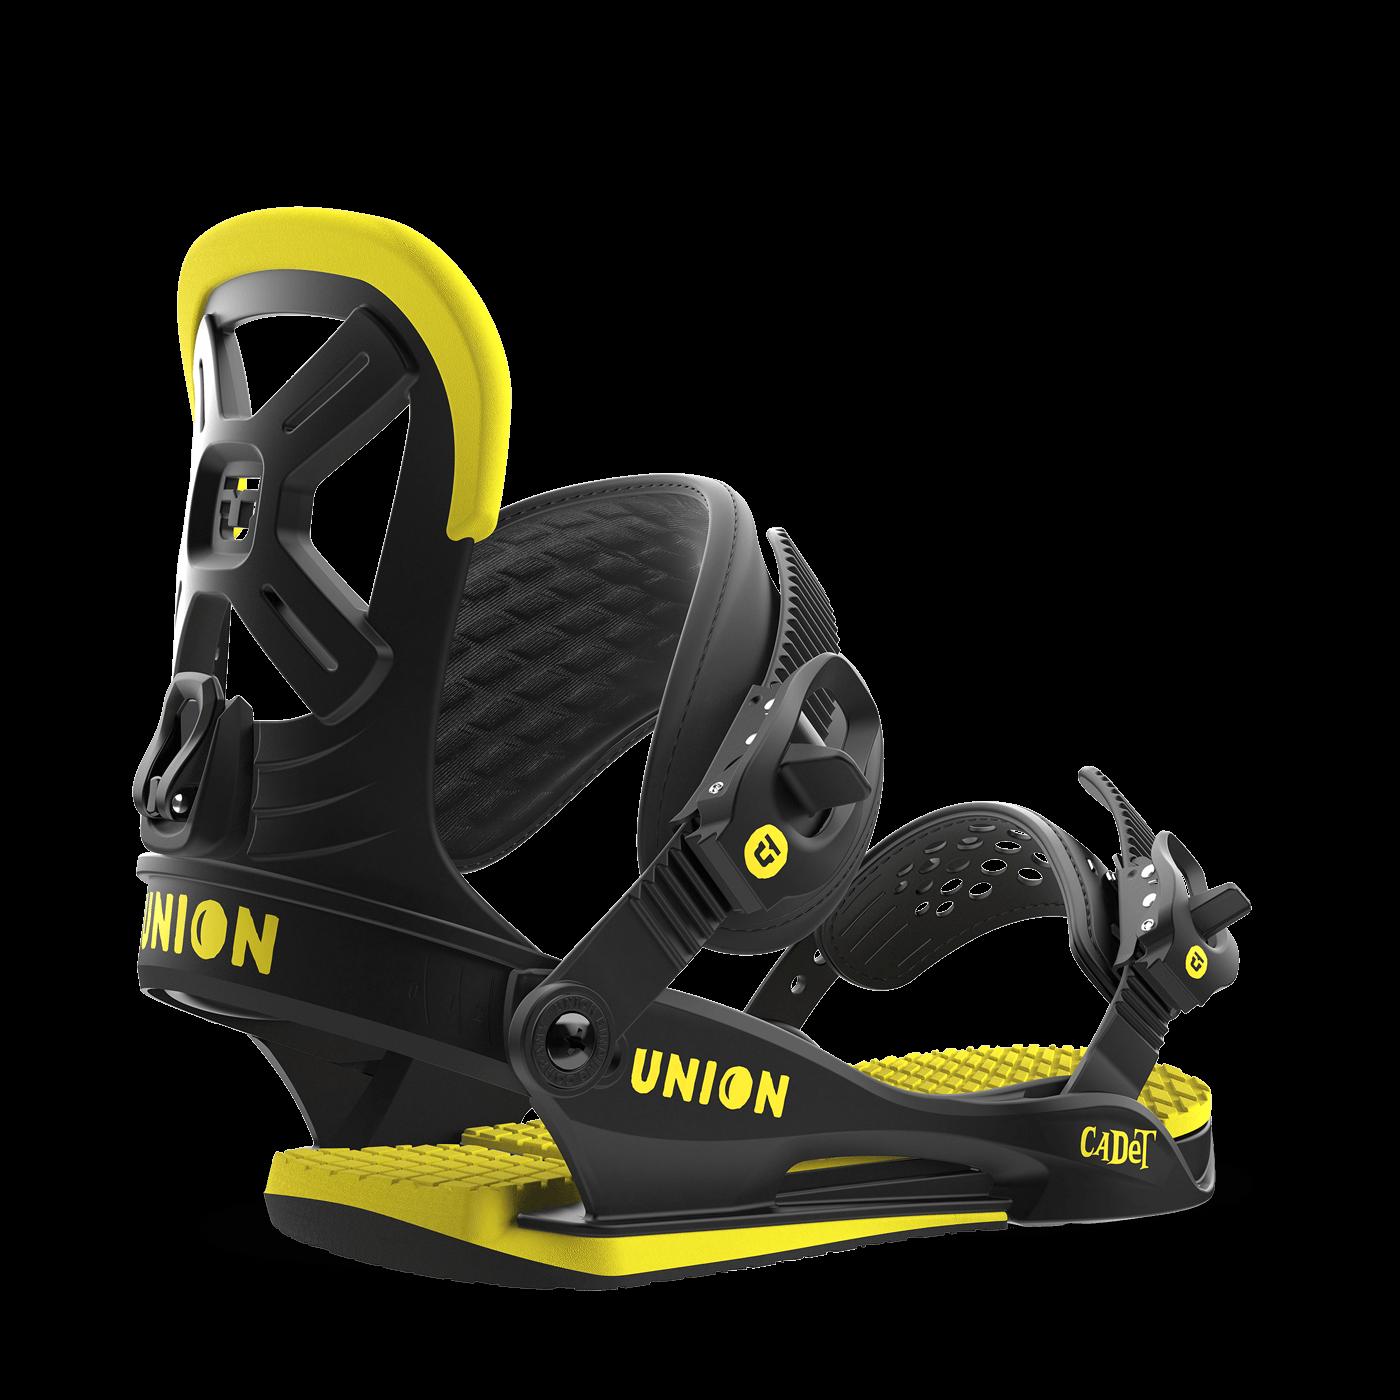 Union Cadet Snowboard Bindings